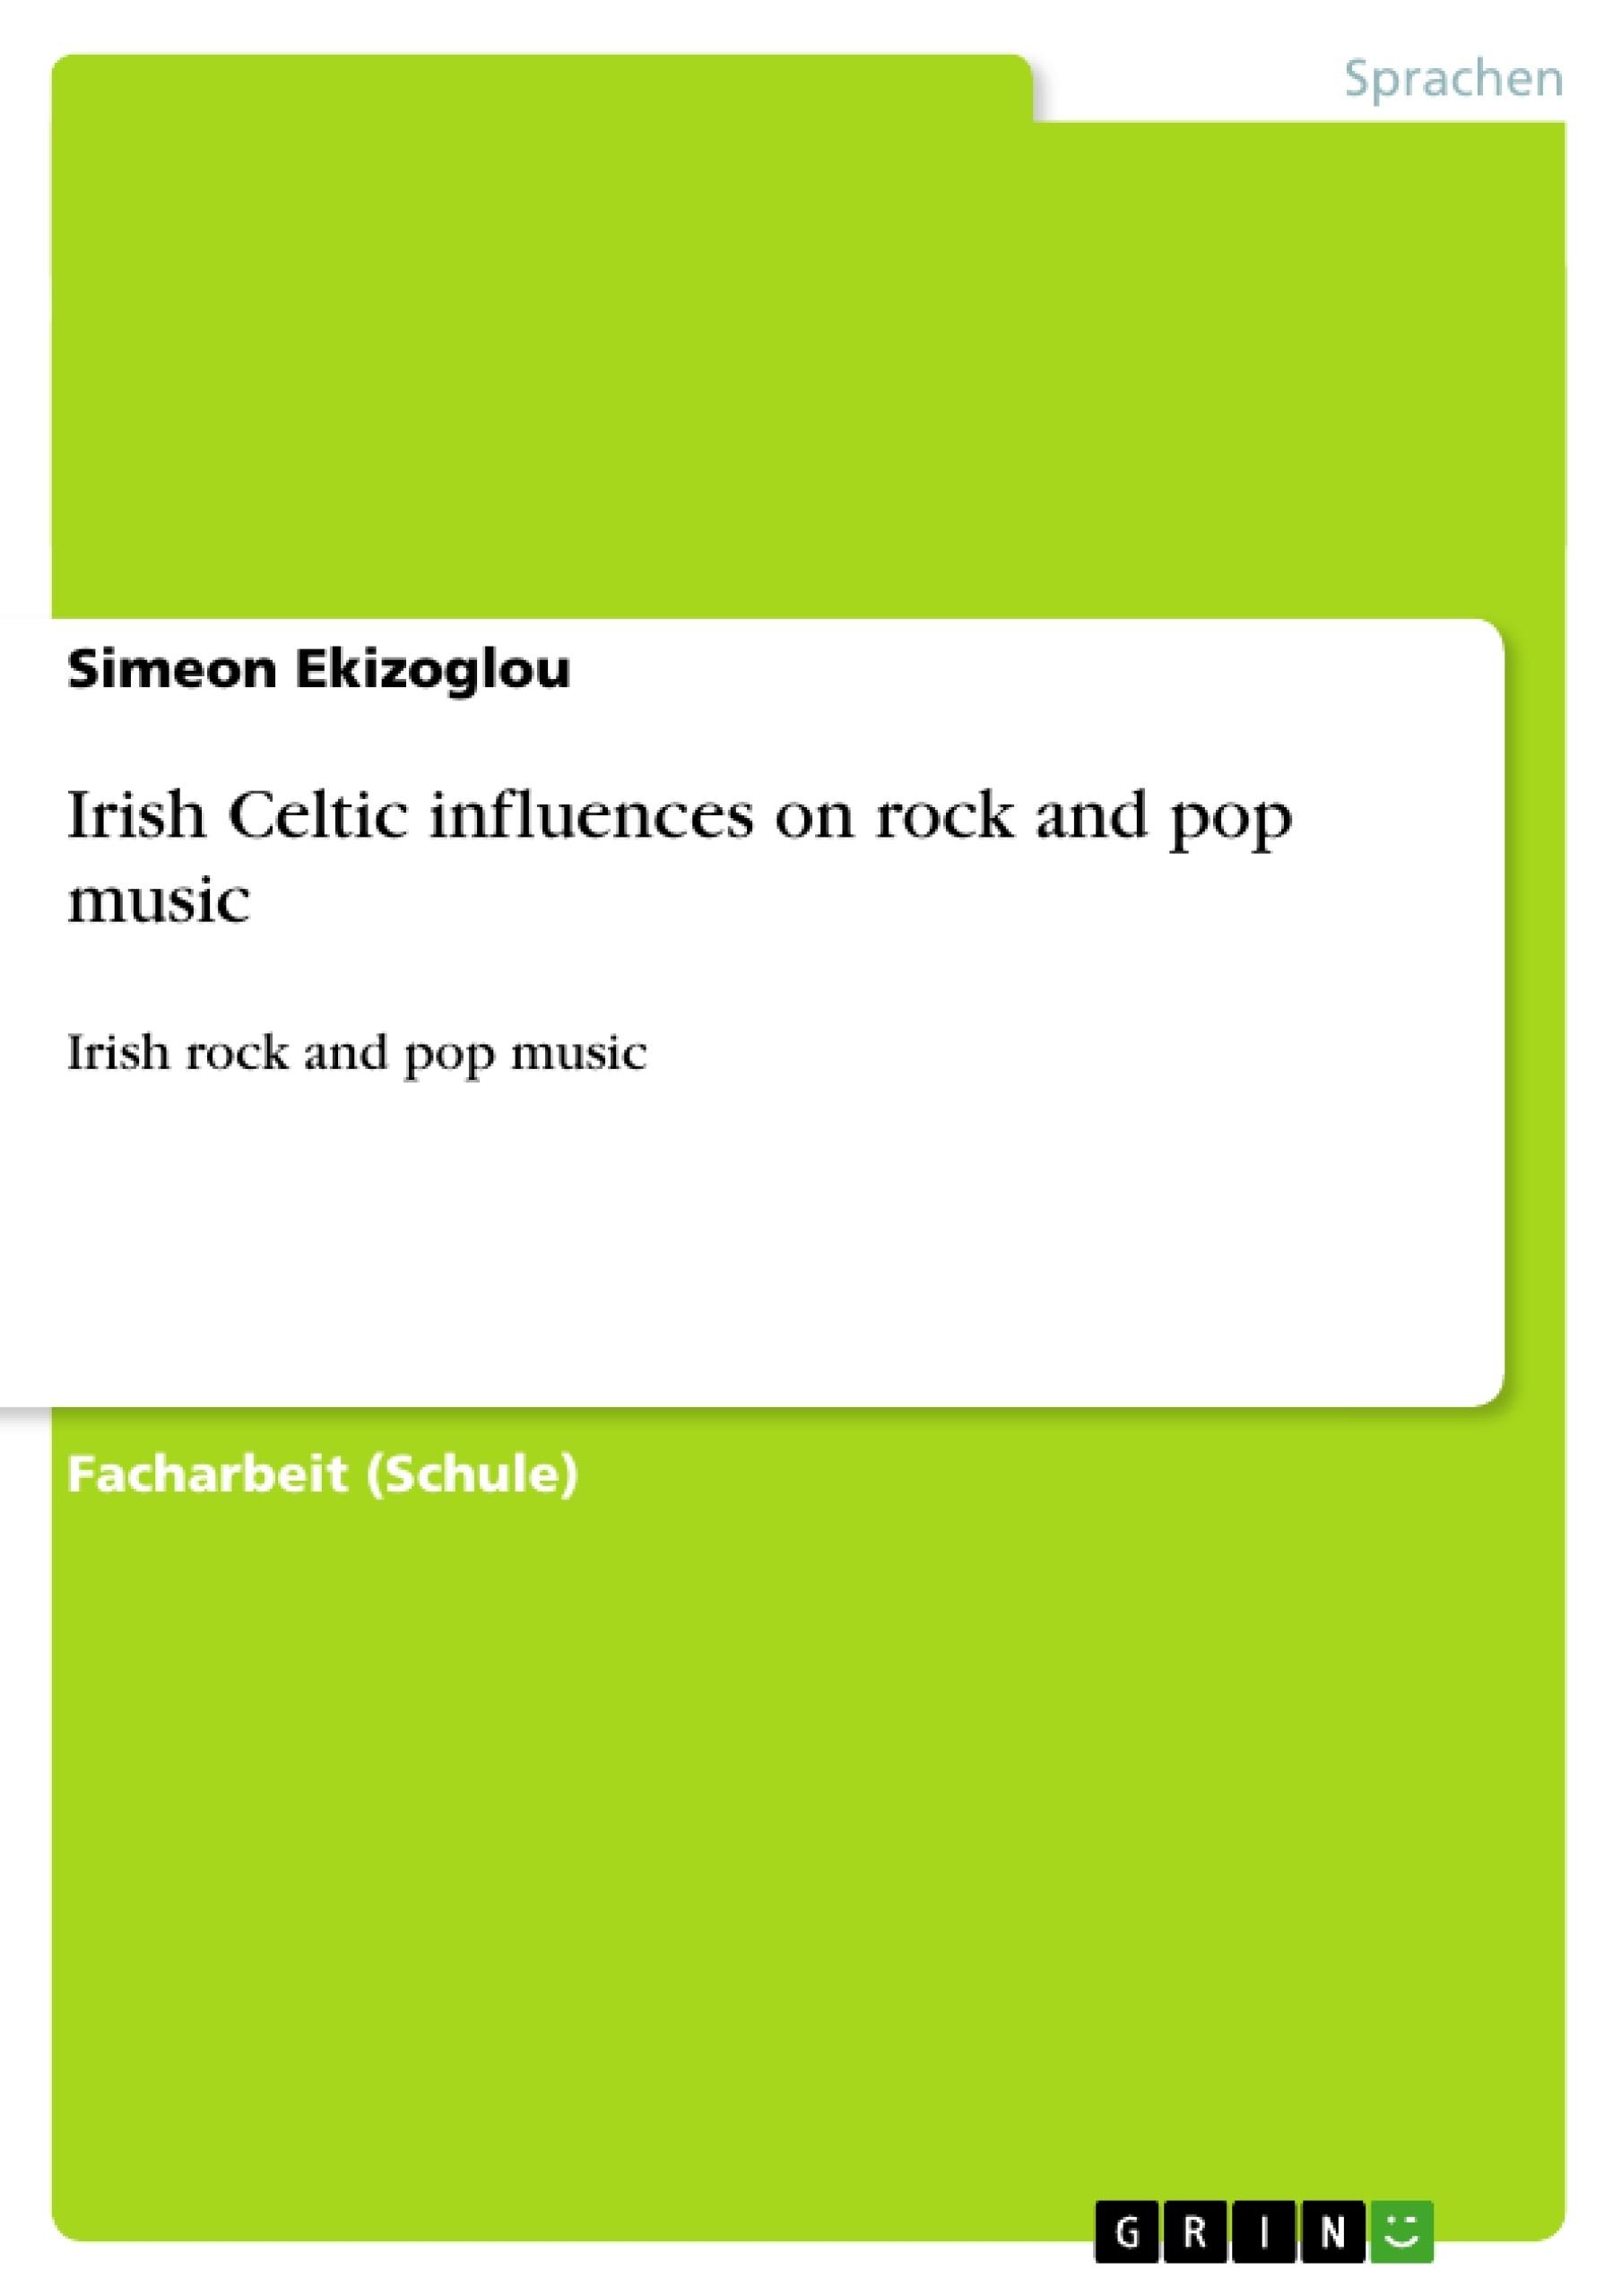 Titel: Irish Celtic influences on rock and pop music